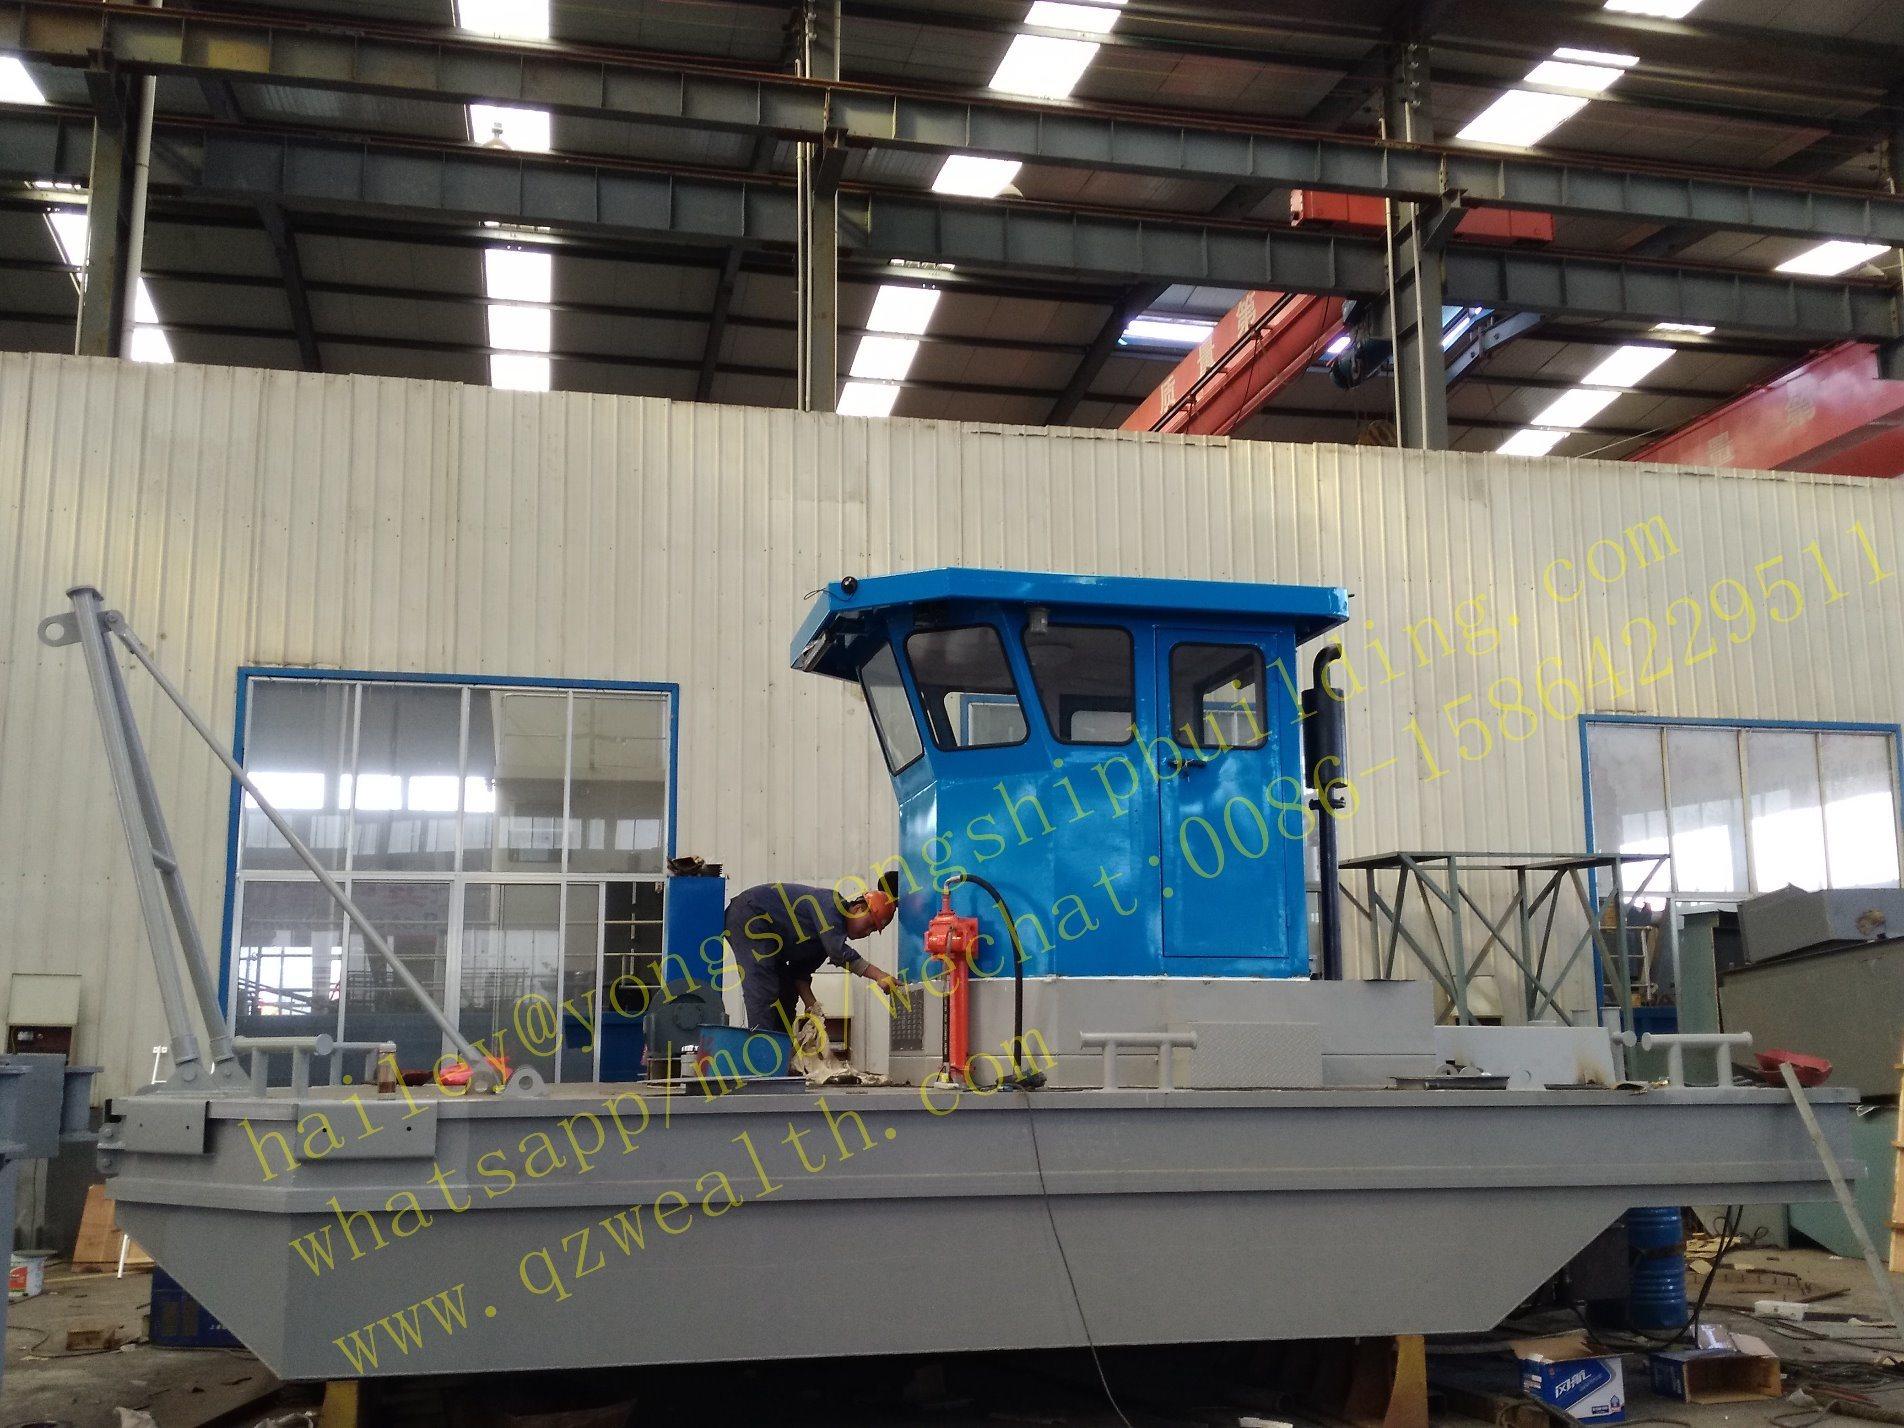 Dismountable Tug Boat